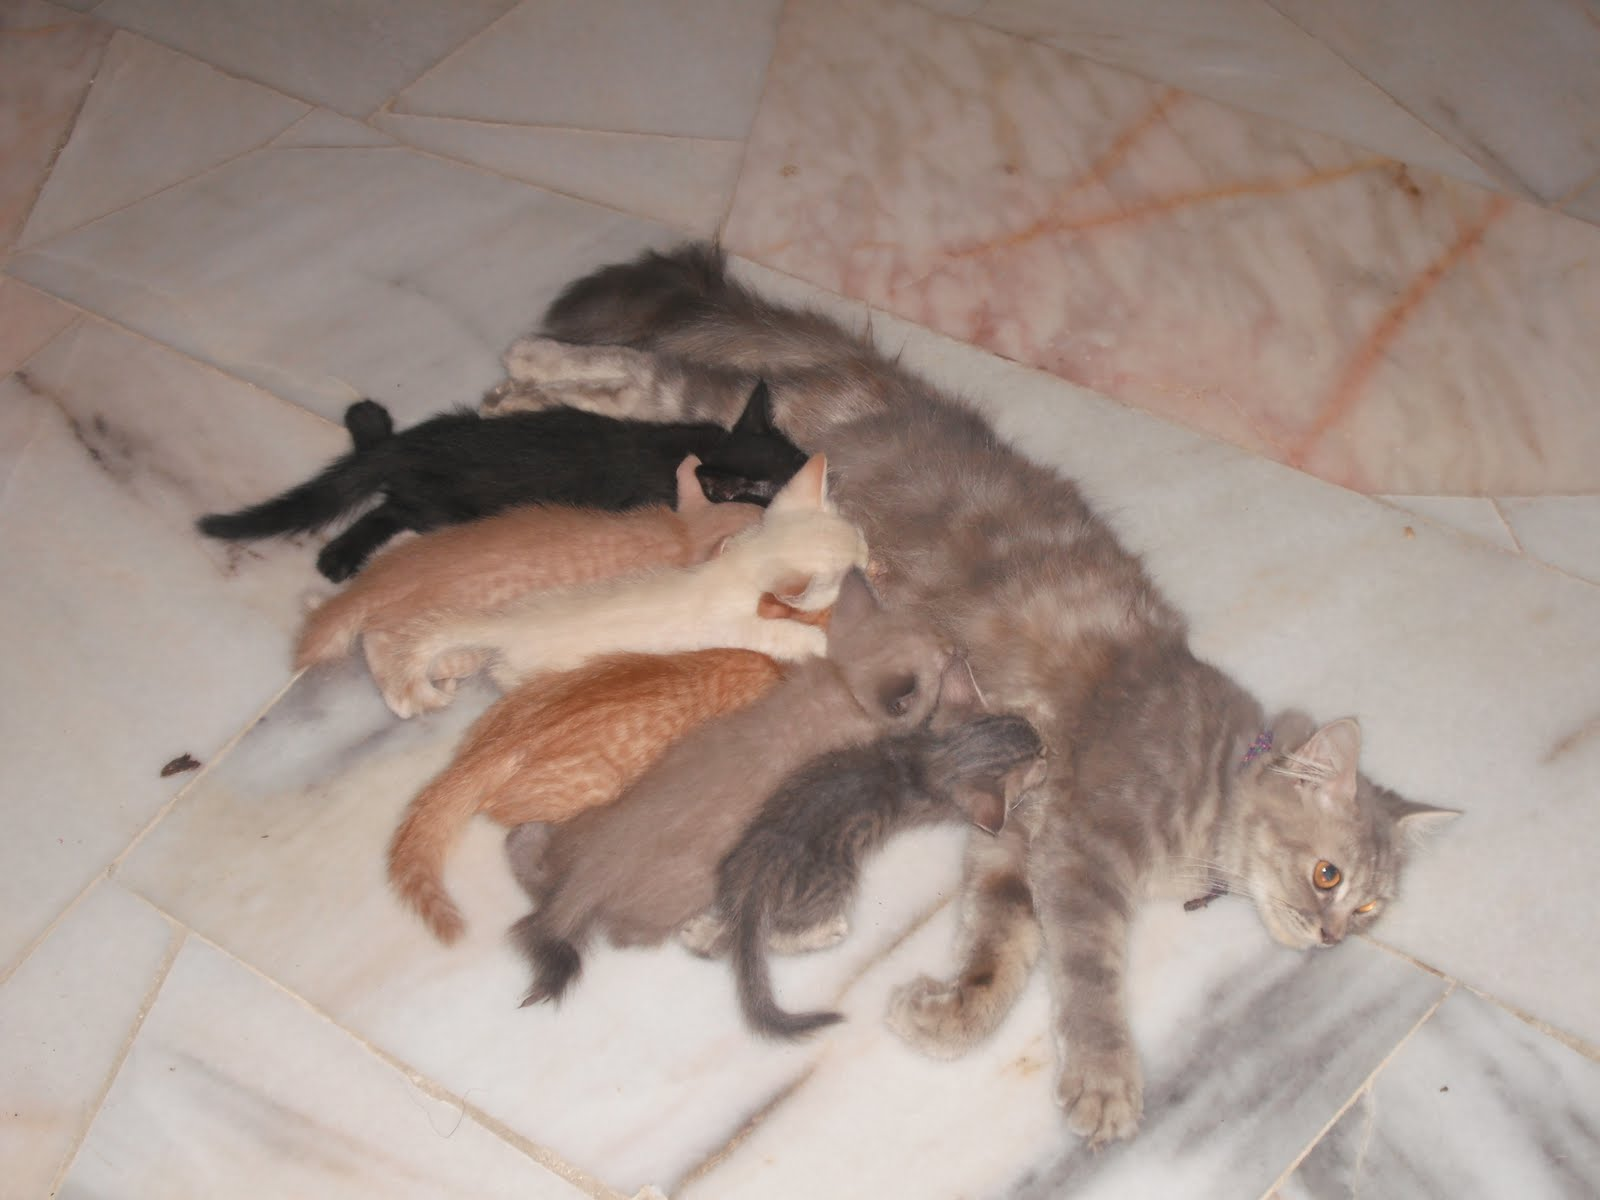 Hidup Bagaikan Satu Perlumbaan Sedangkan Kucing Tau